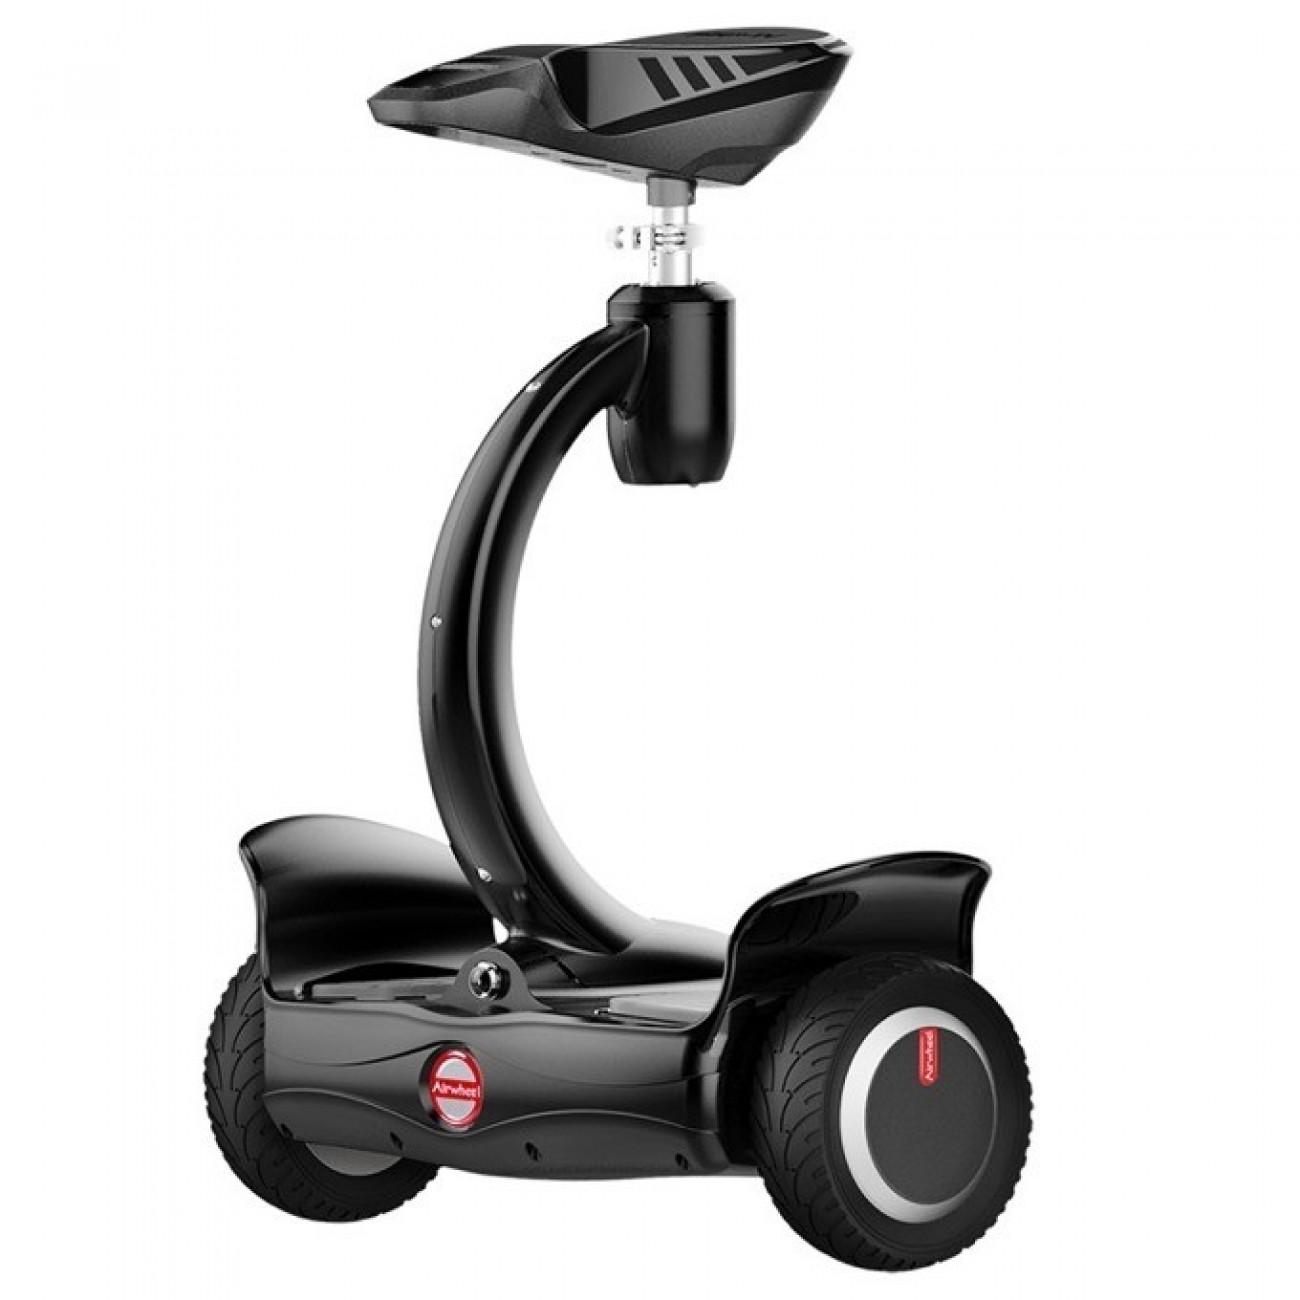 Електрически скутер Airwheel S8Mini, до 17км/ч, 360° завъртане, регулируем наклон, до 100кг, черен в Електрически превозни средства - Airwheel | Alleop